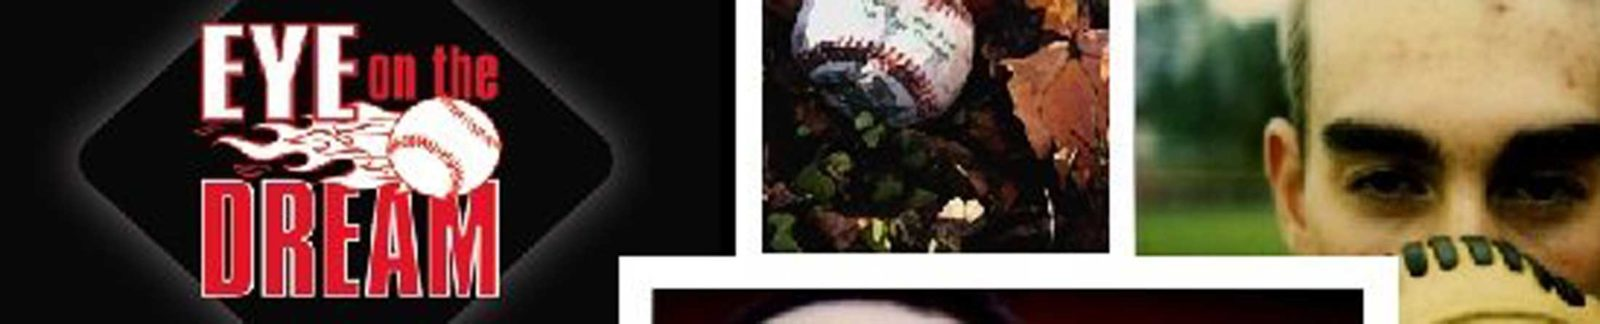 Eye On The Dream - baseball movie header